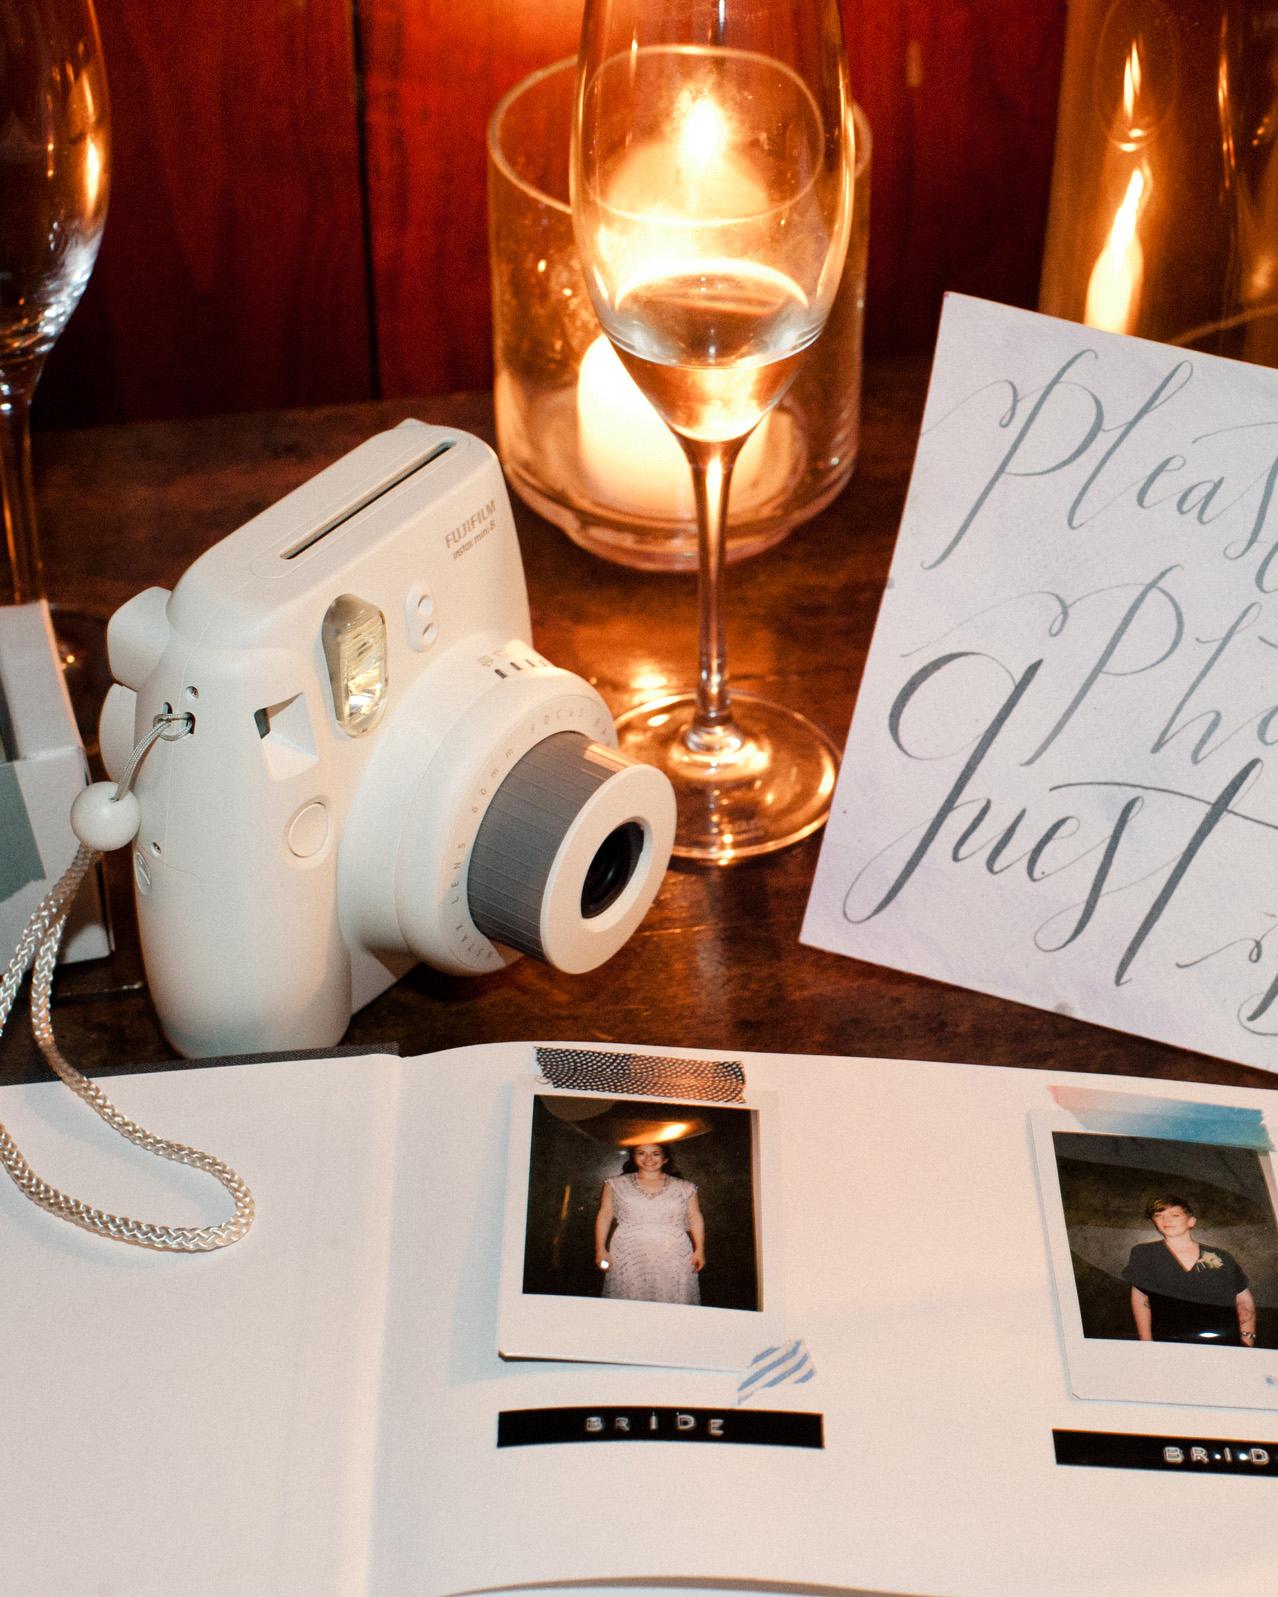 sydney-christina-wedding-guestbook-098-s111743-0115.jpg